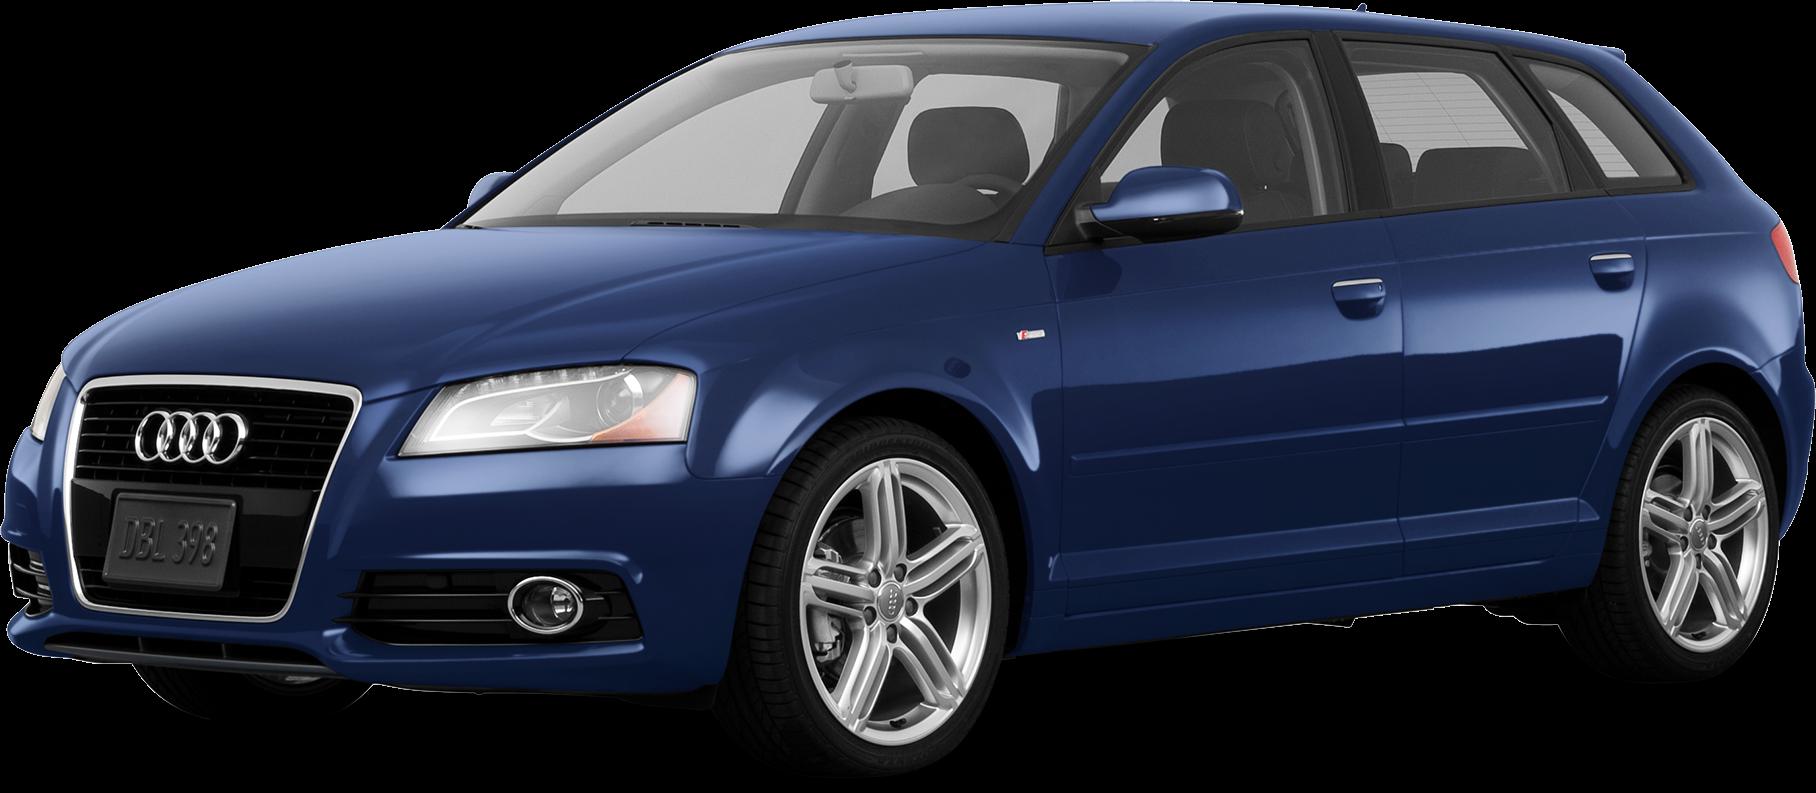 2010 Volkswagen Touareg | Pricing, Ratings, Expert Review